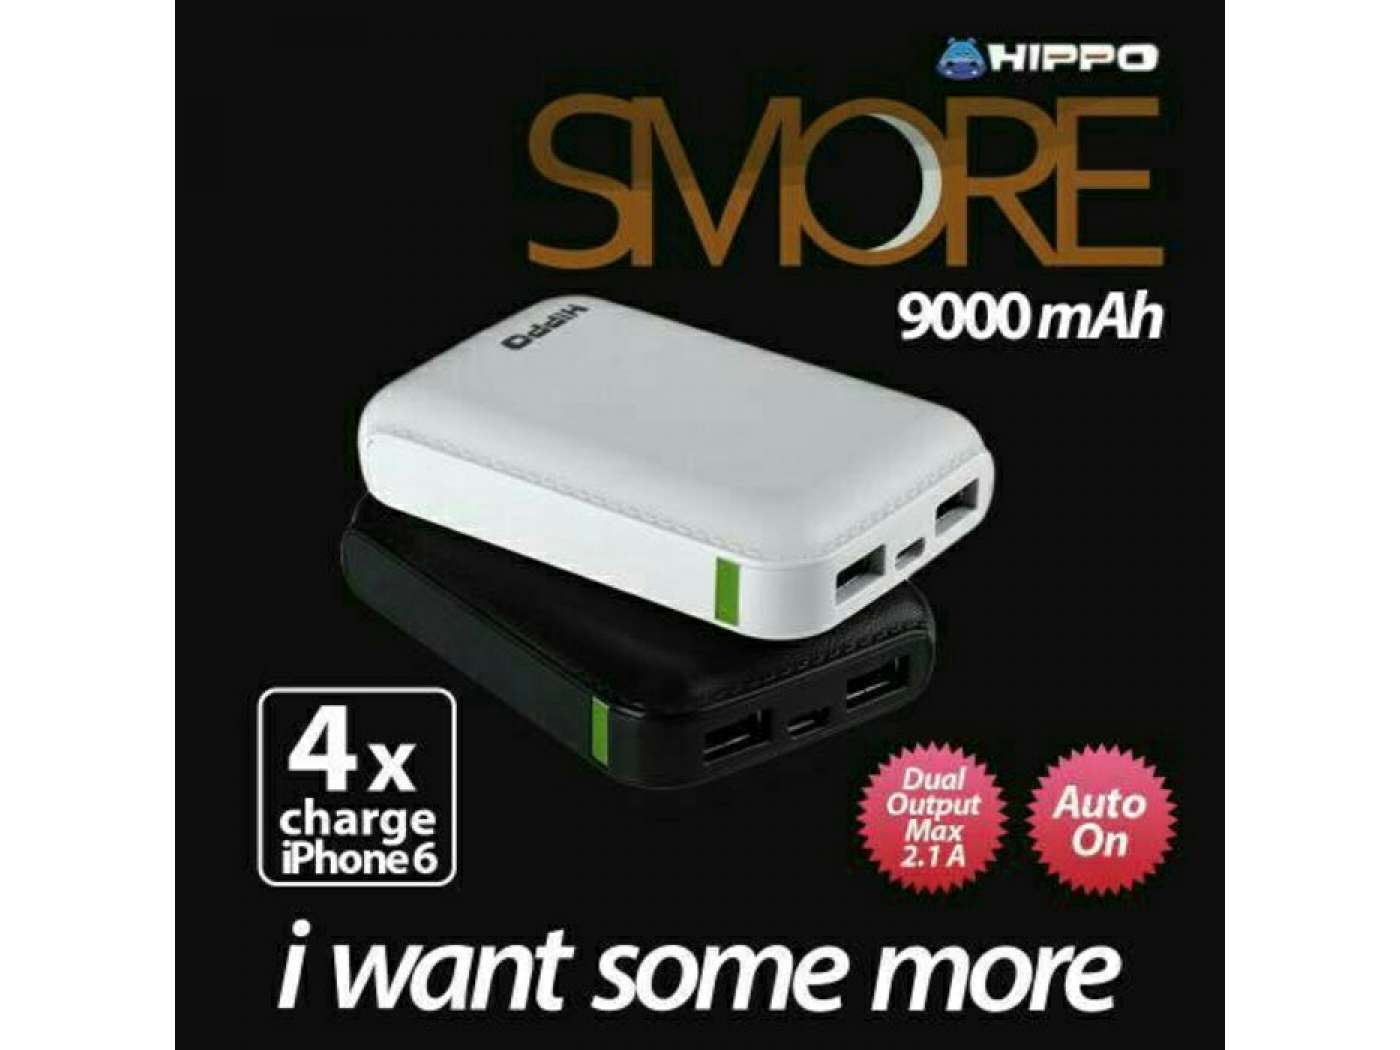 Power Bank HIPPO SMORE 9000 mAh Free VOYAGER (Mini Travel Bag)